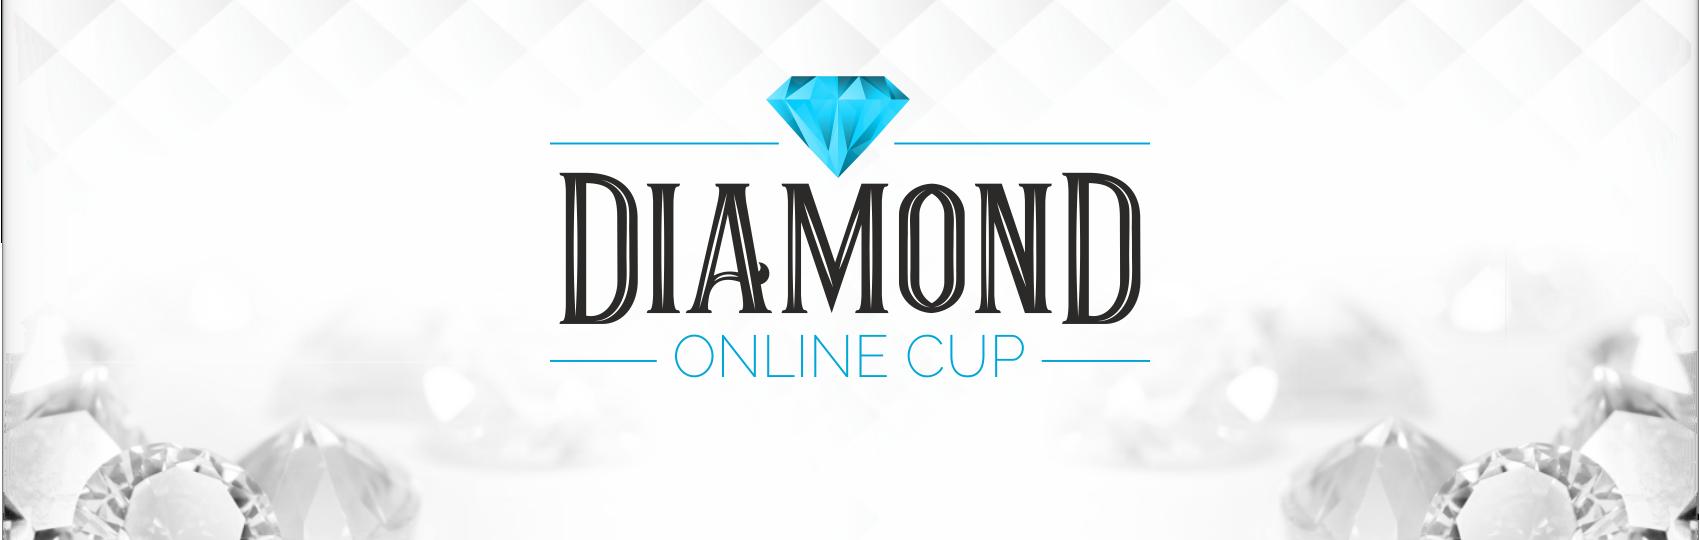 Diamond Online Cup